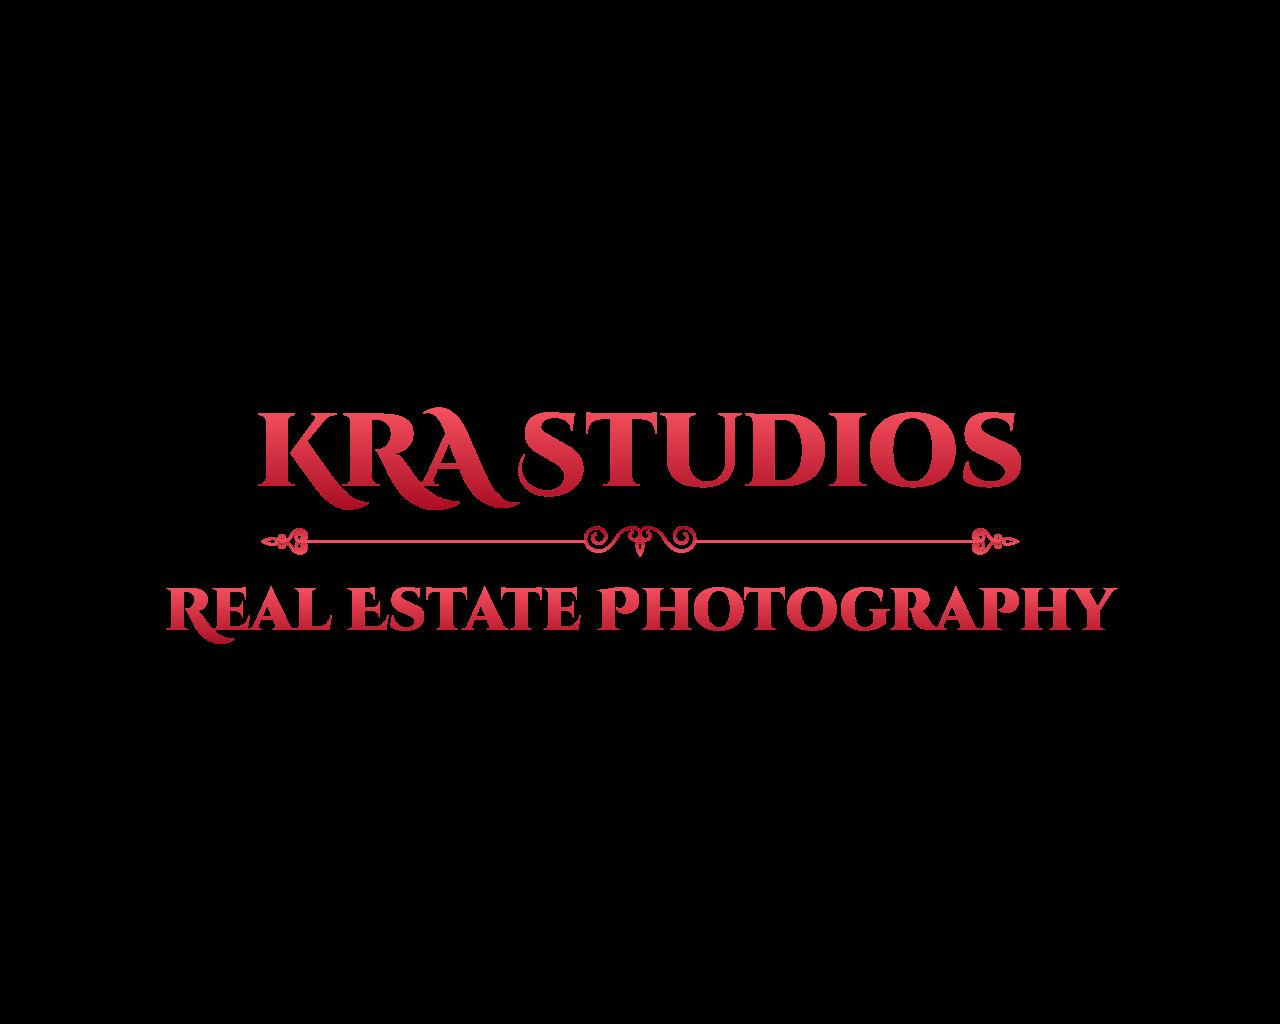 KRA Studios floor plan in Auburn Opelika